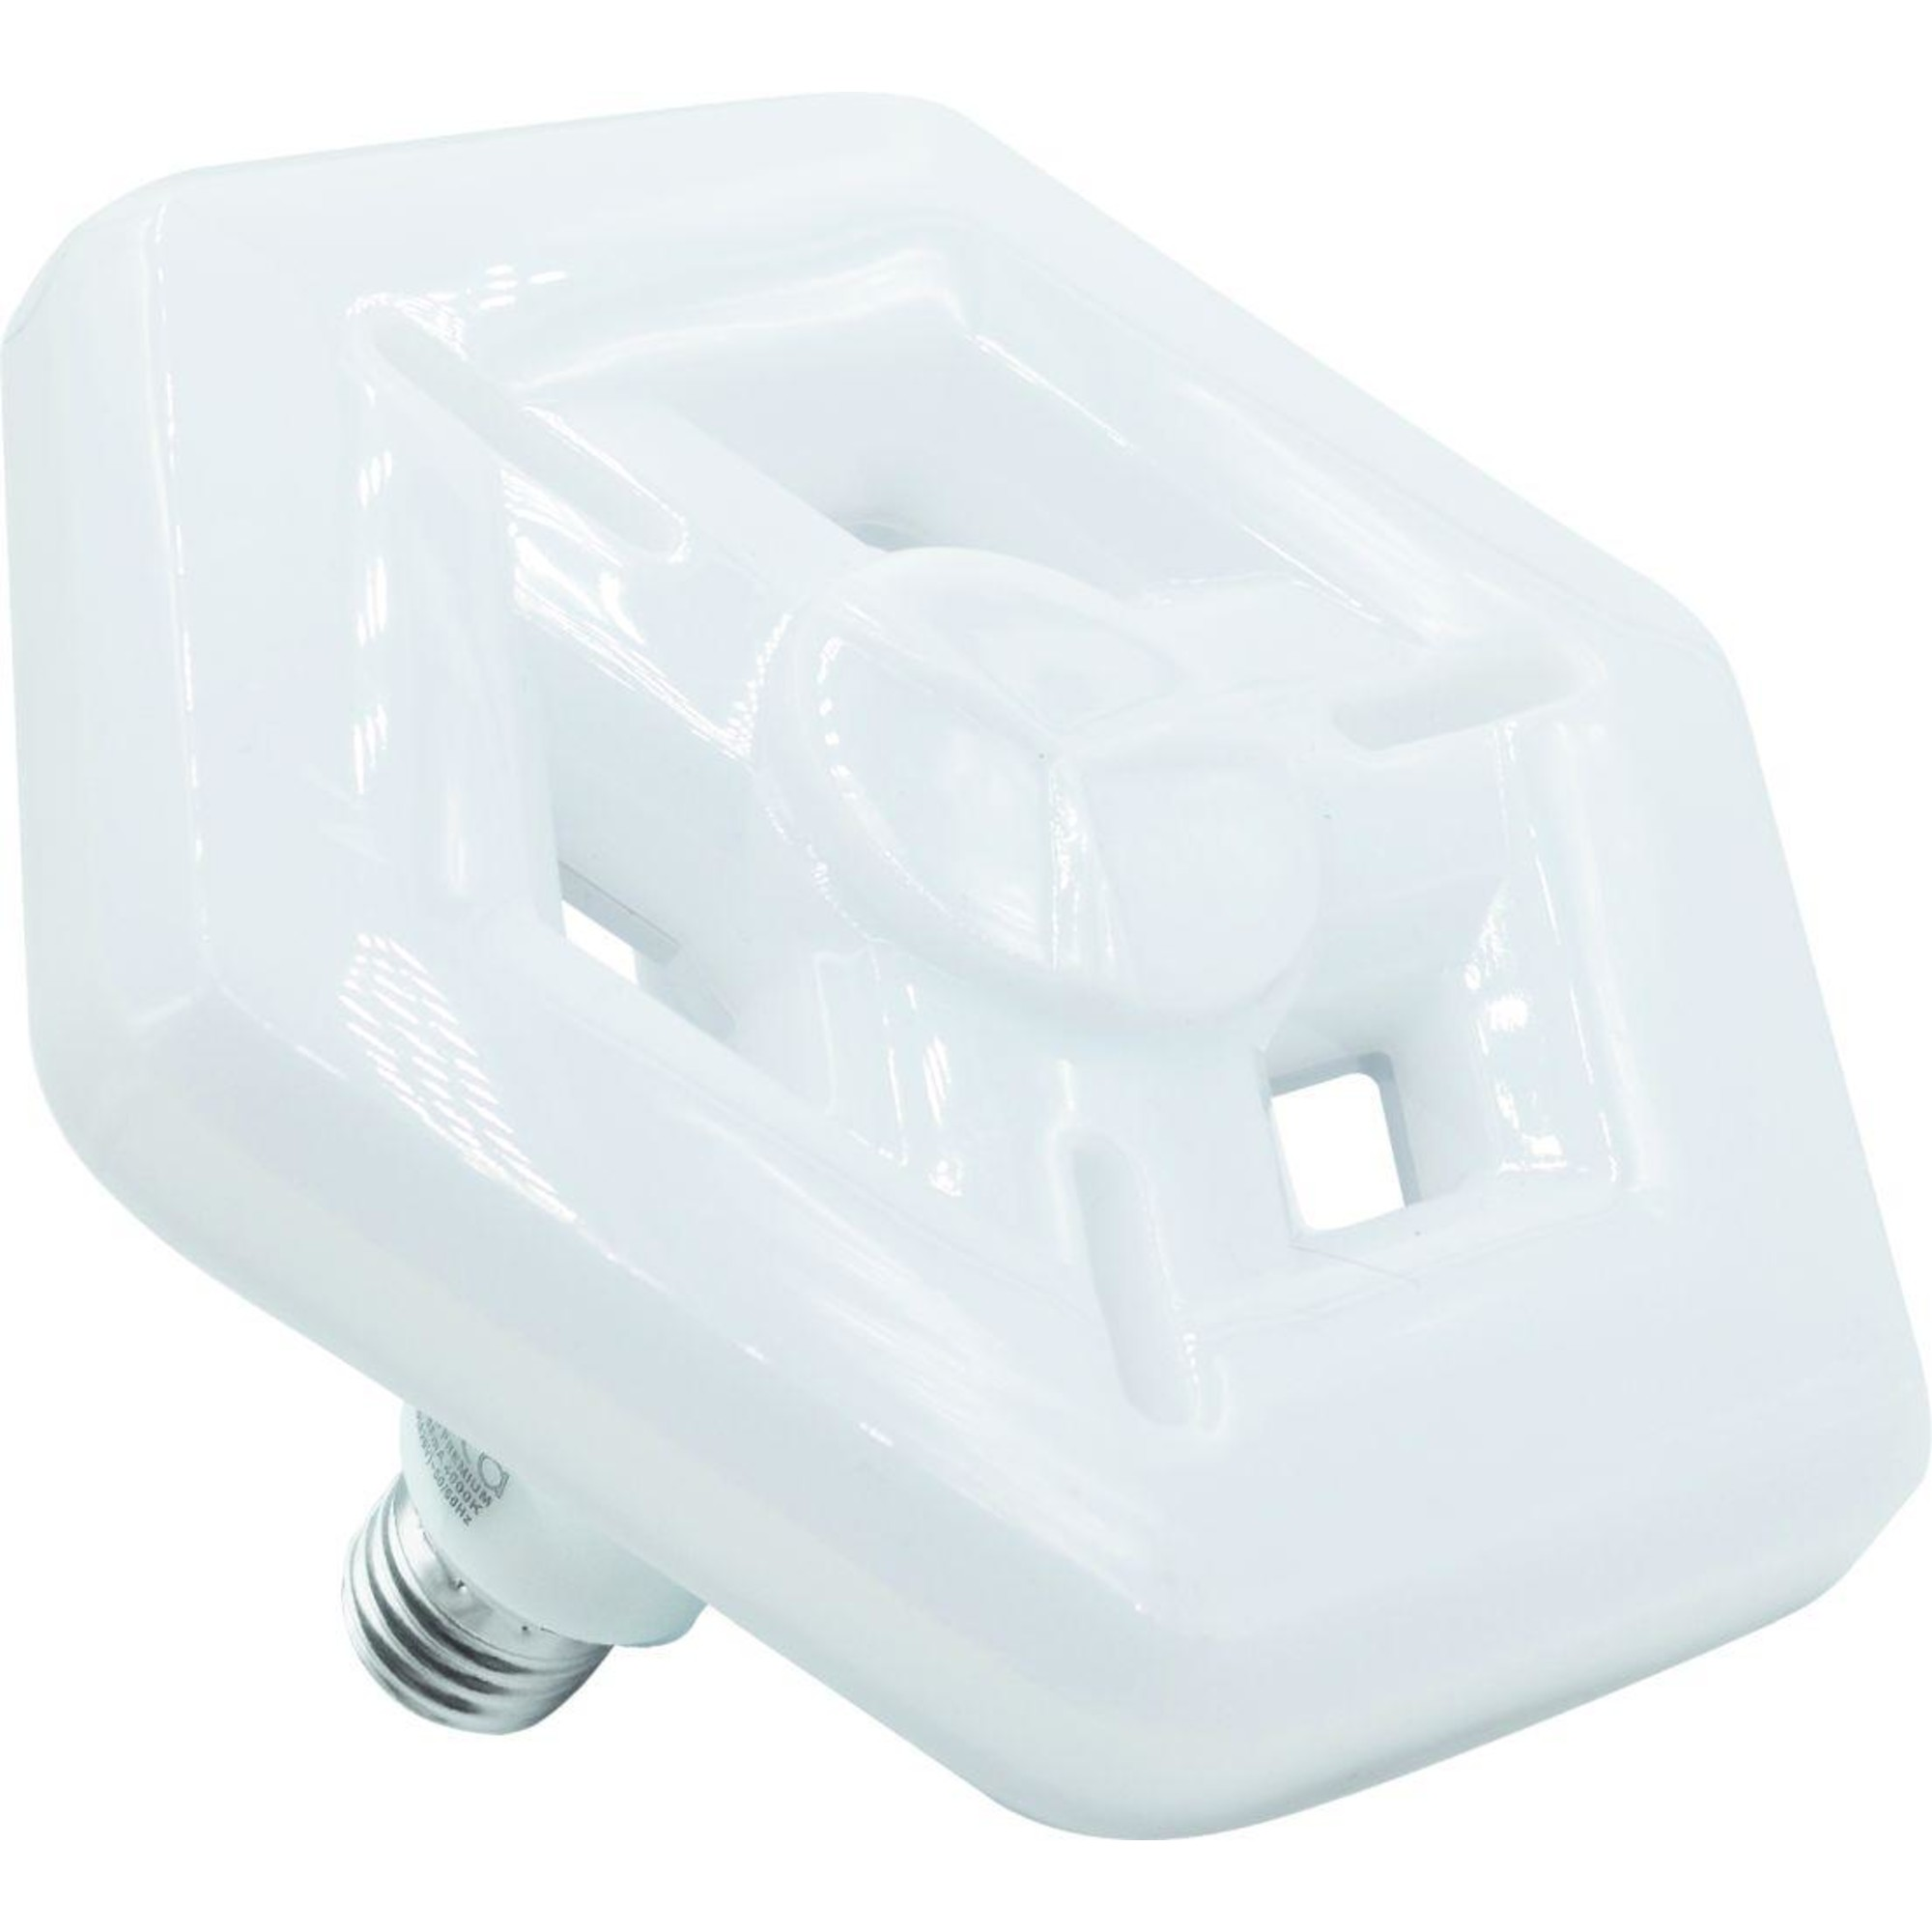 Лампа Ecola Premium светодионая E27 27 Вт 2430 Лм теплый свет